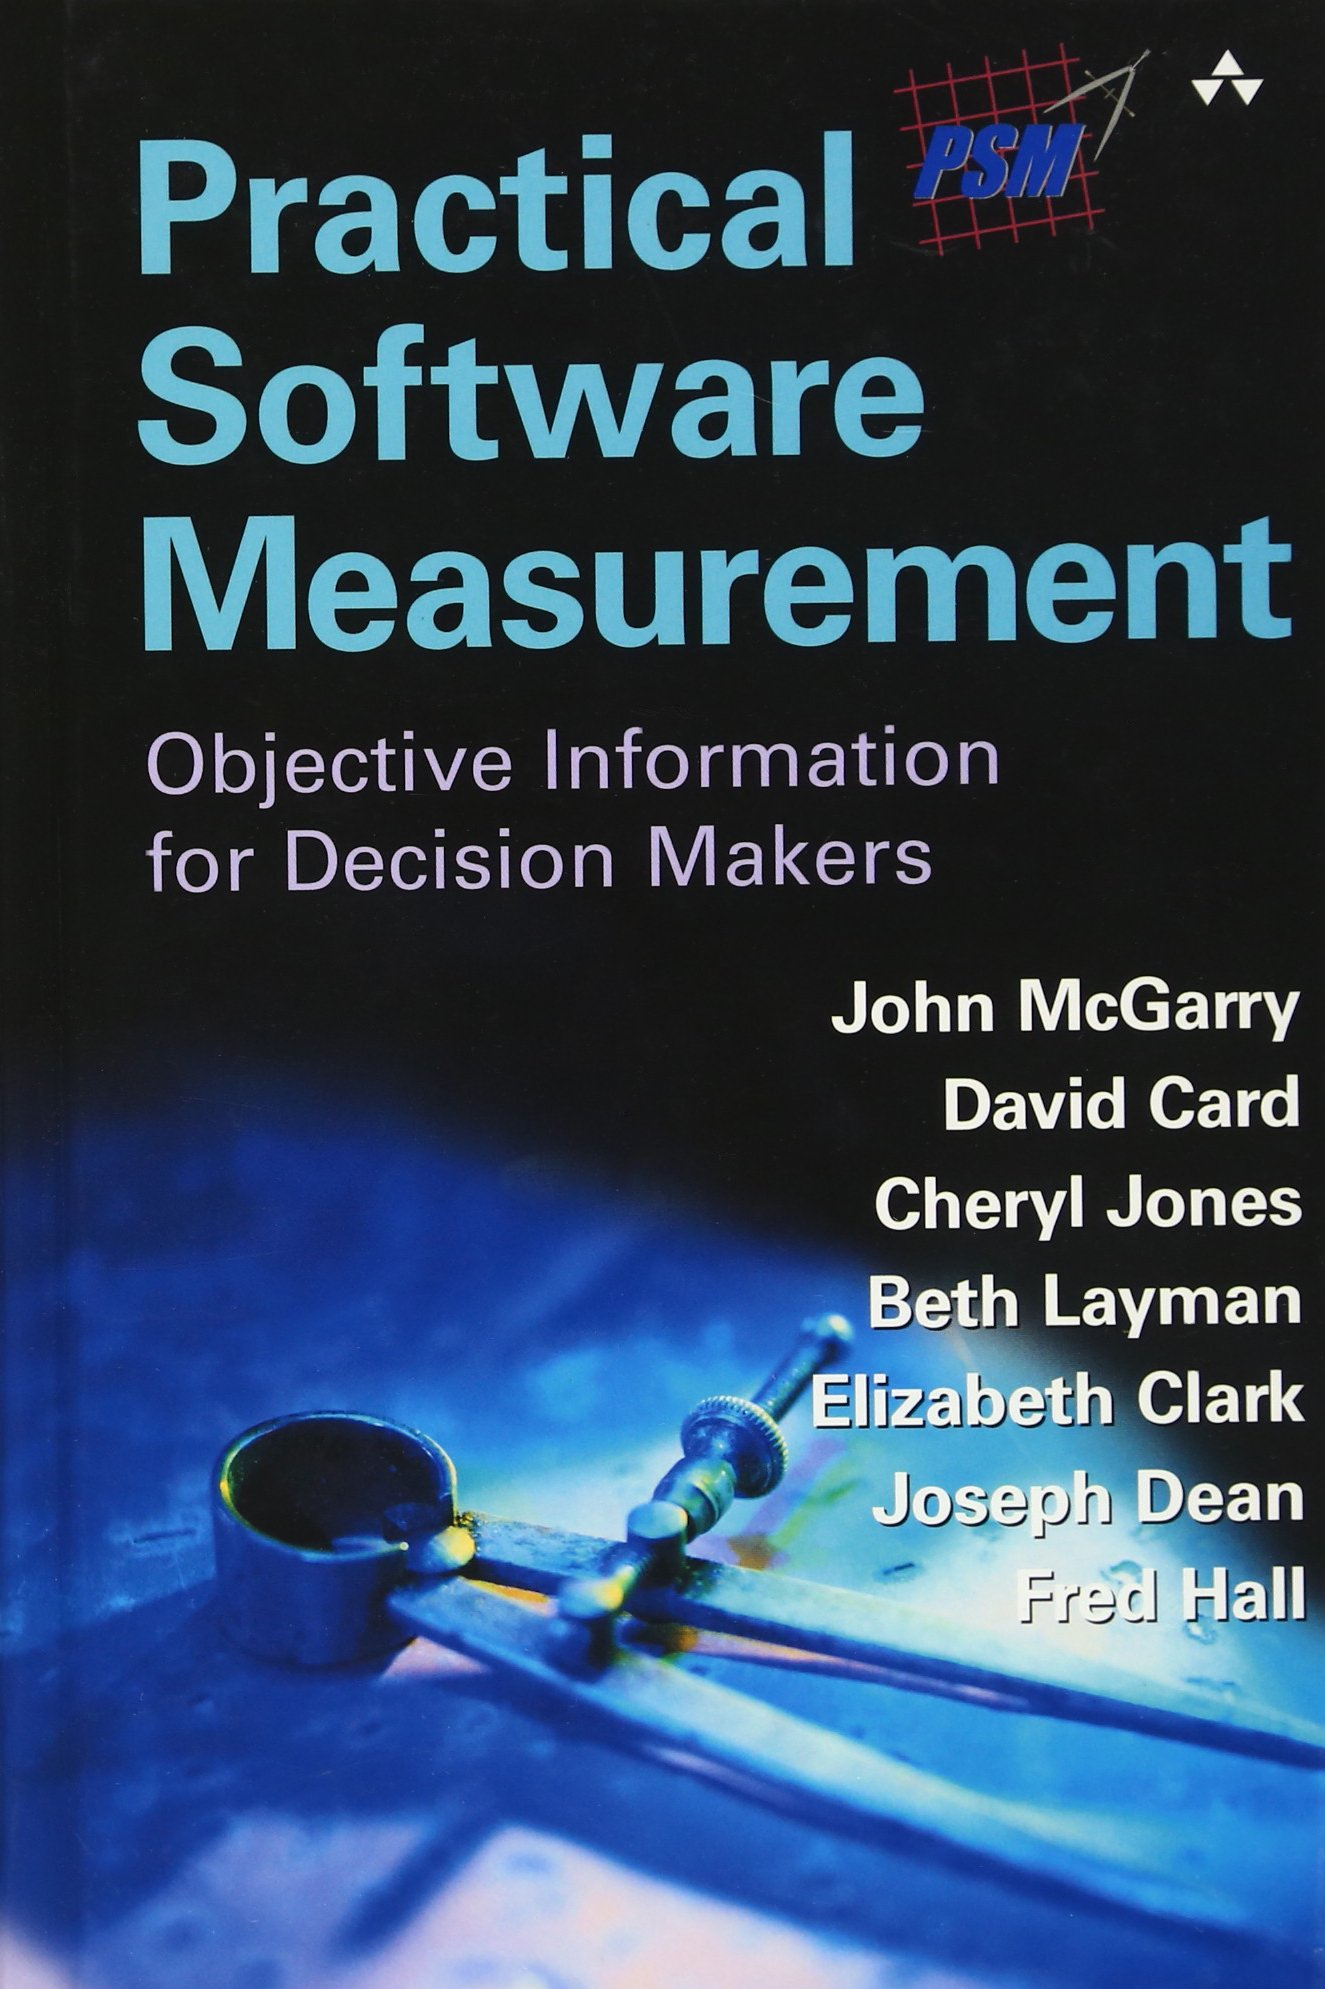 Practical Software Measurement: Objective Information for Decision Makers pdf